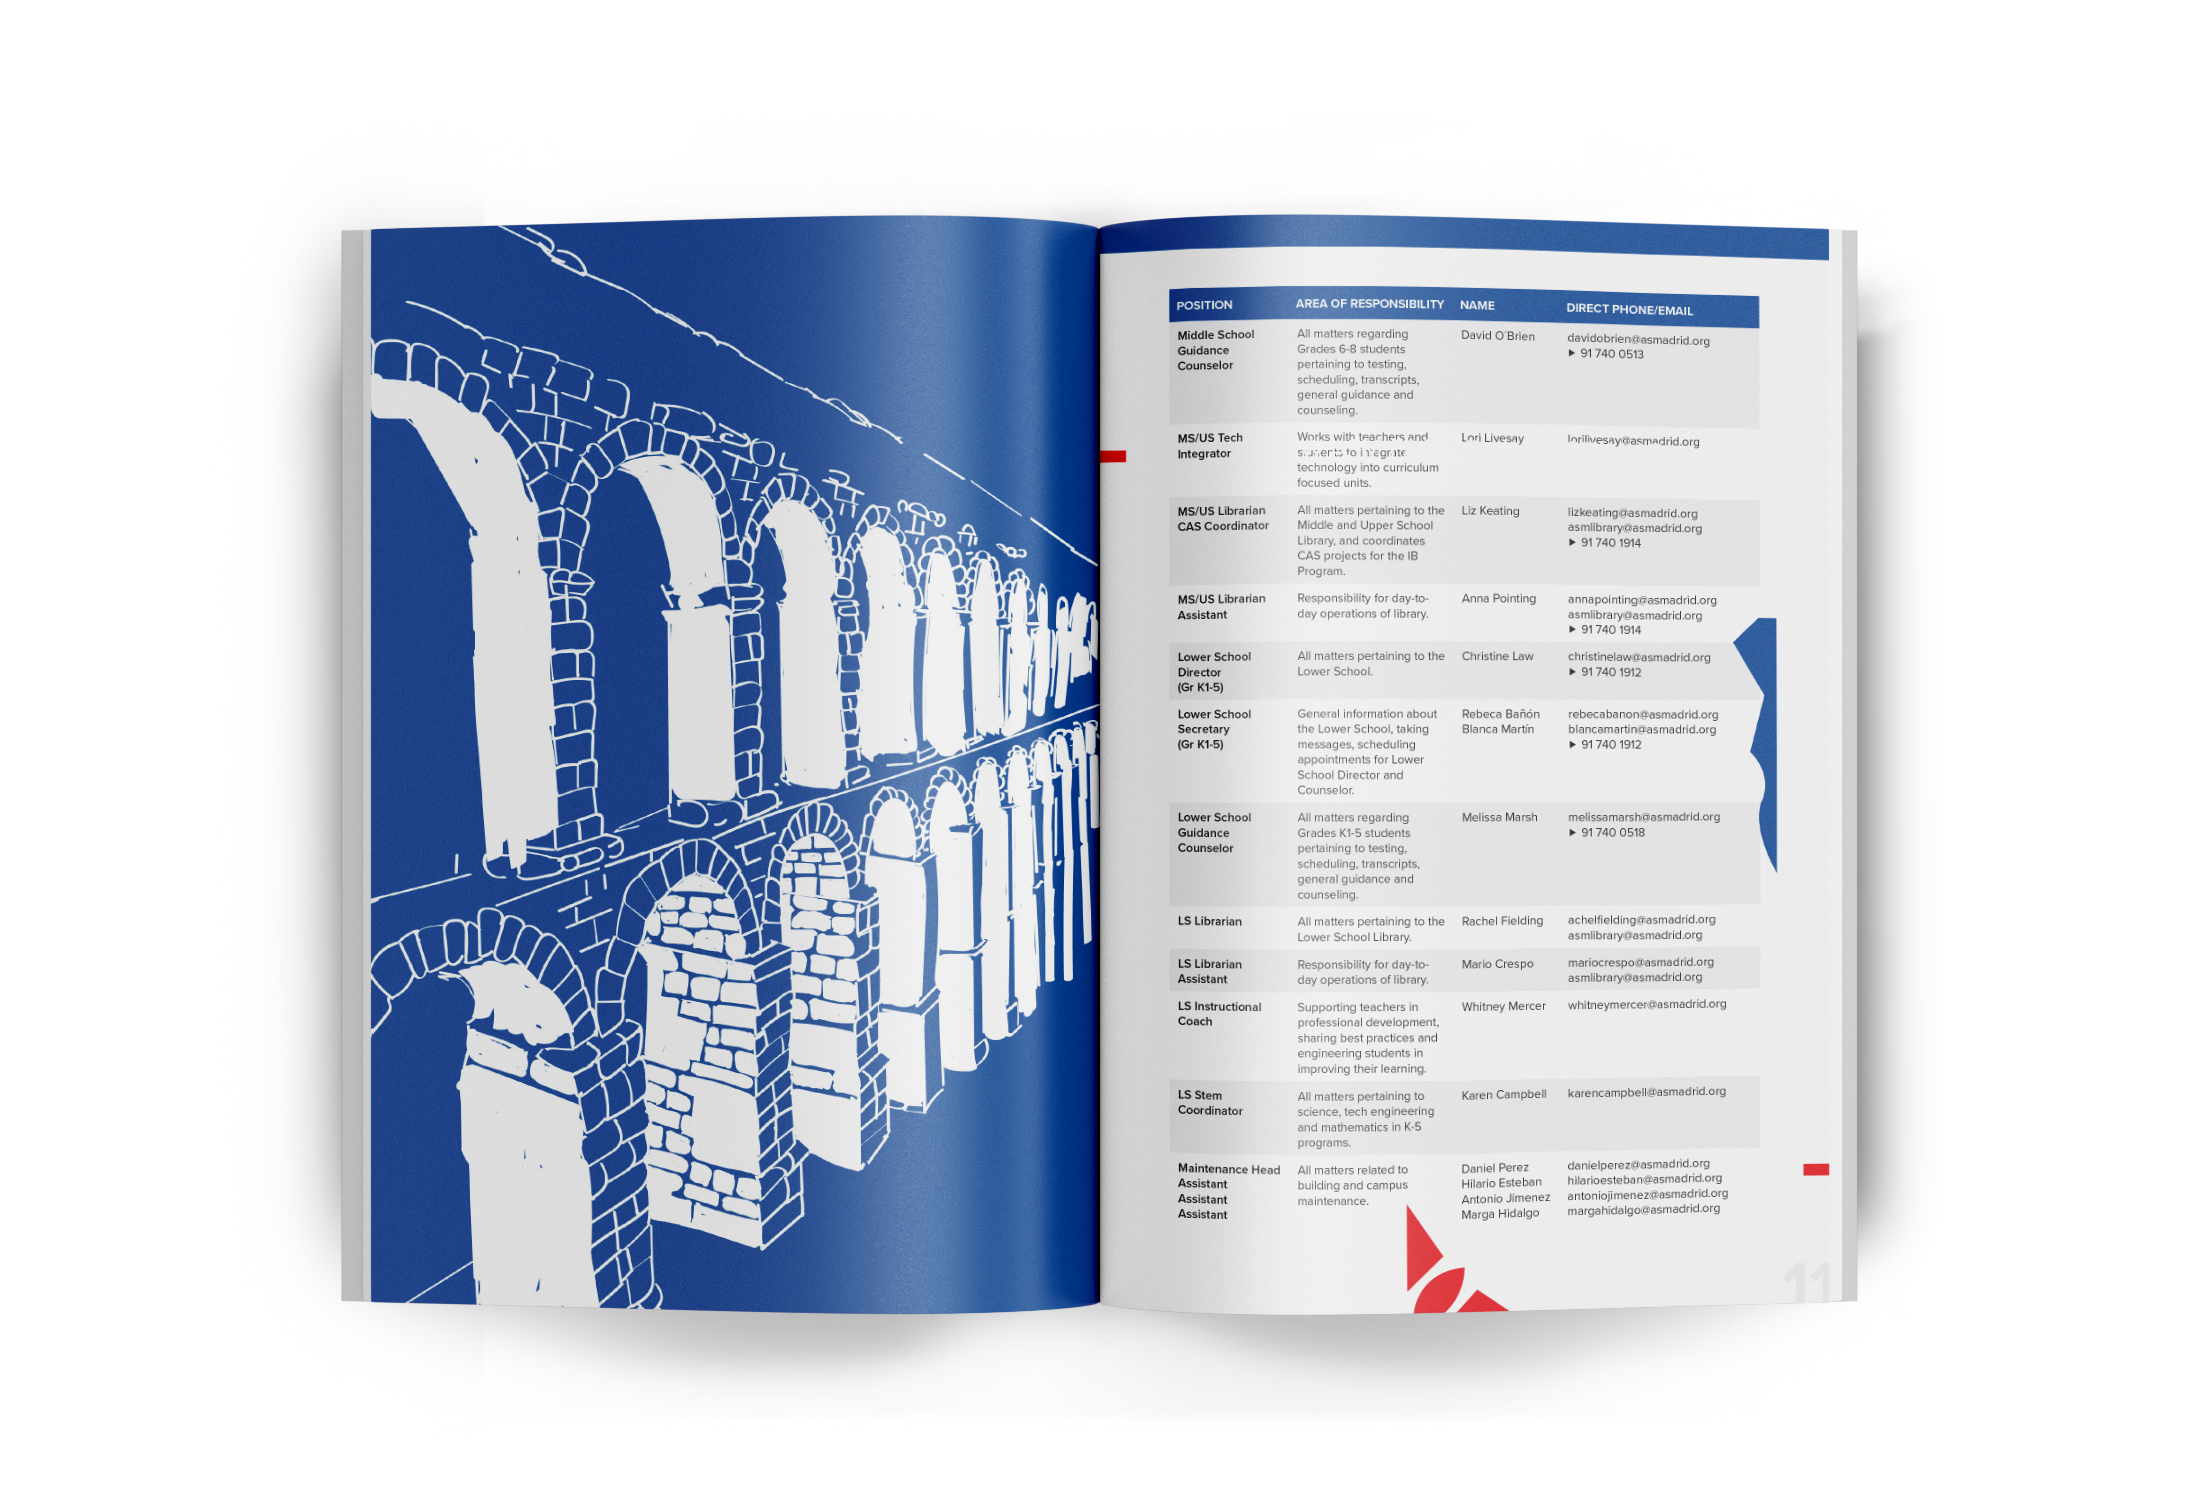 asm-staff-handbook-1718_05.jpg